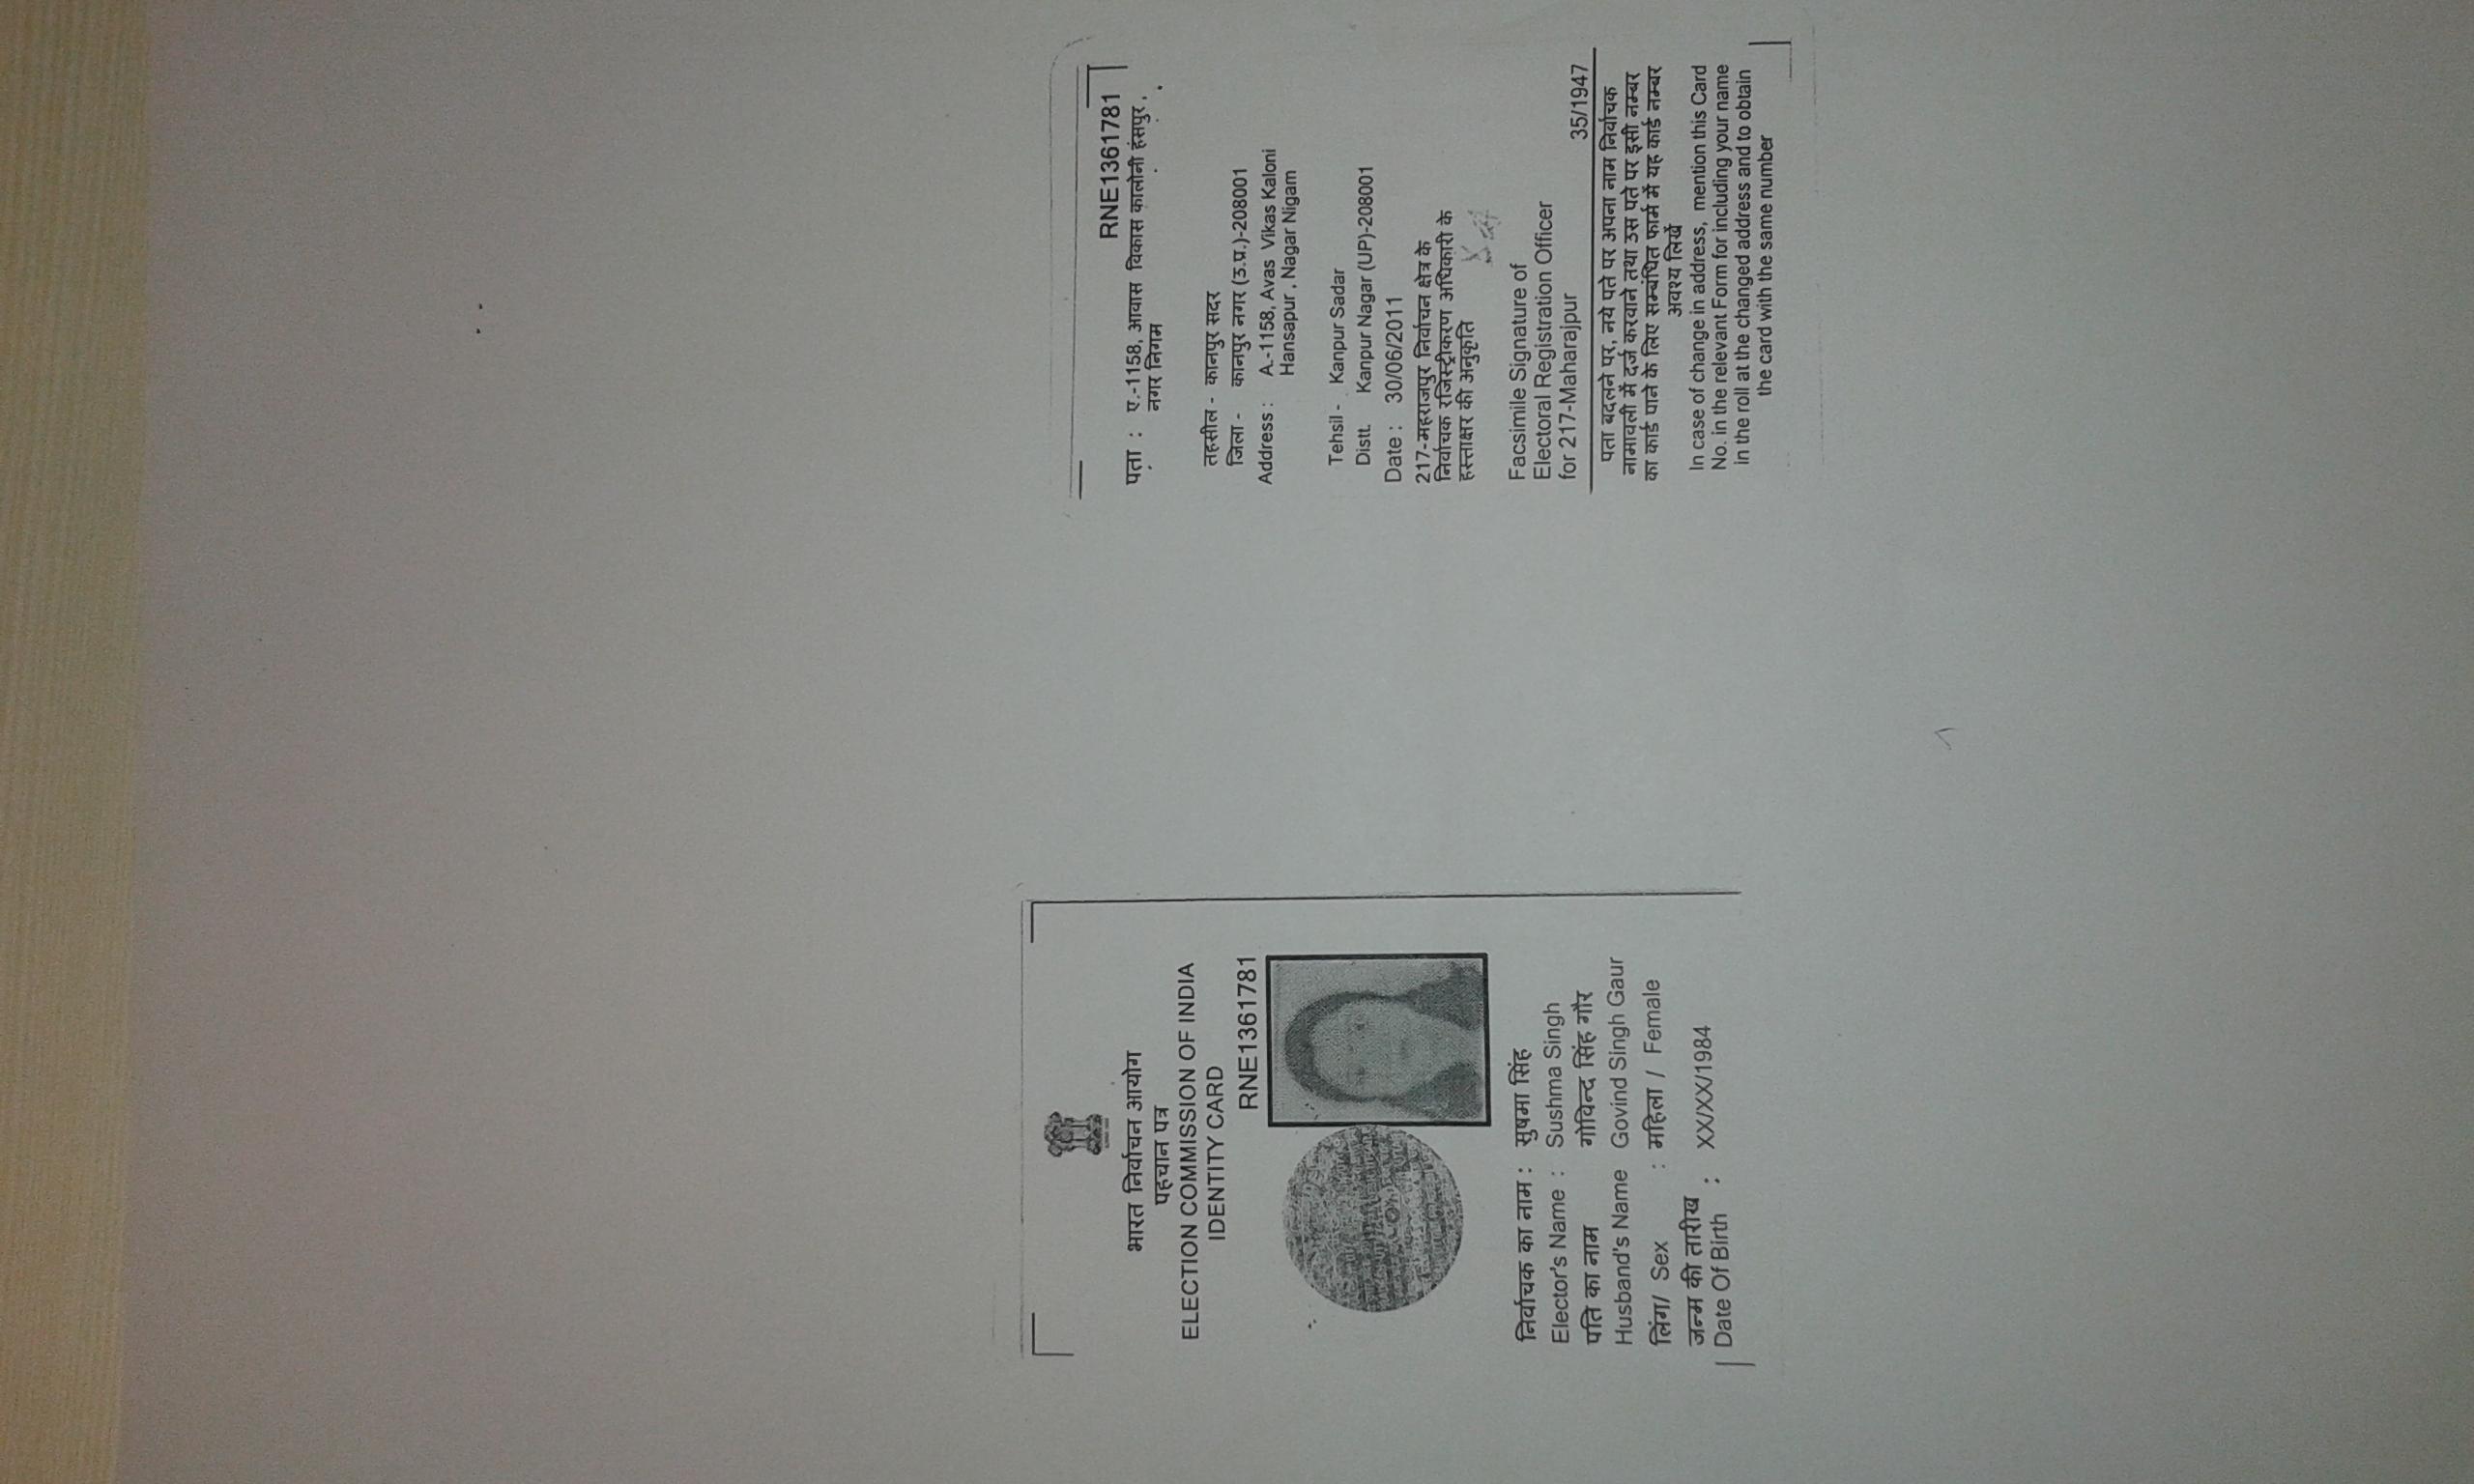 Atractivo Kanpur Nagar Nigam Birth Certificate Status Ilustración ...